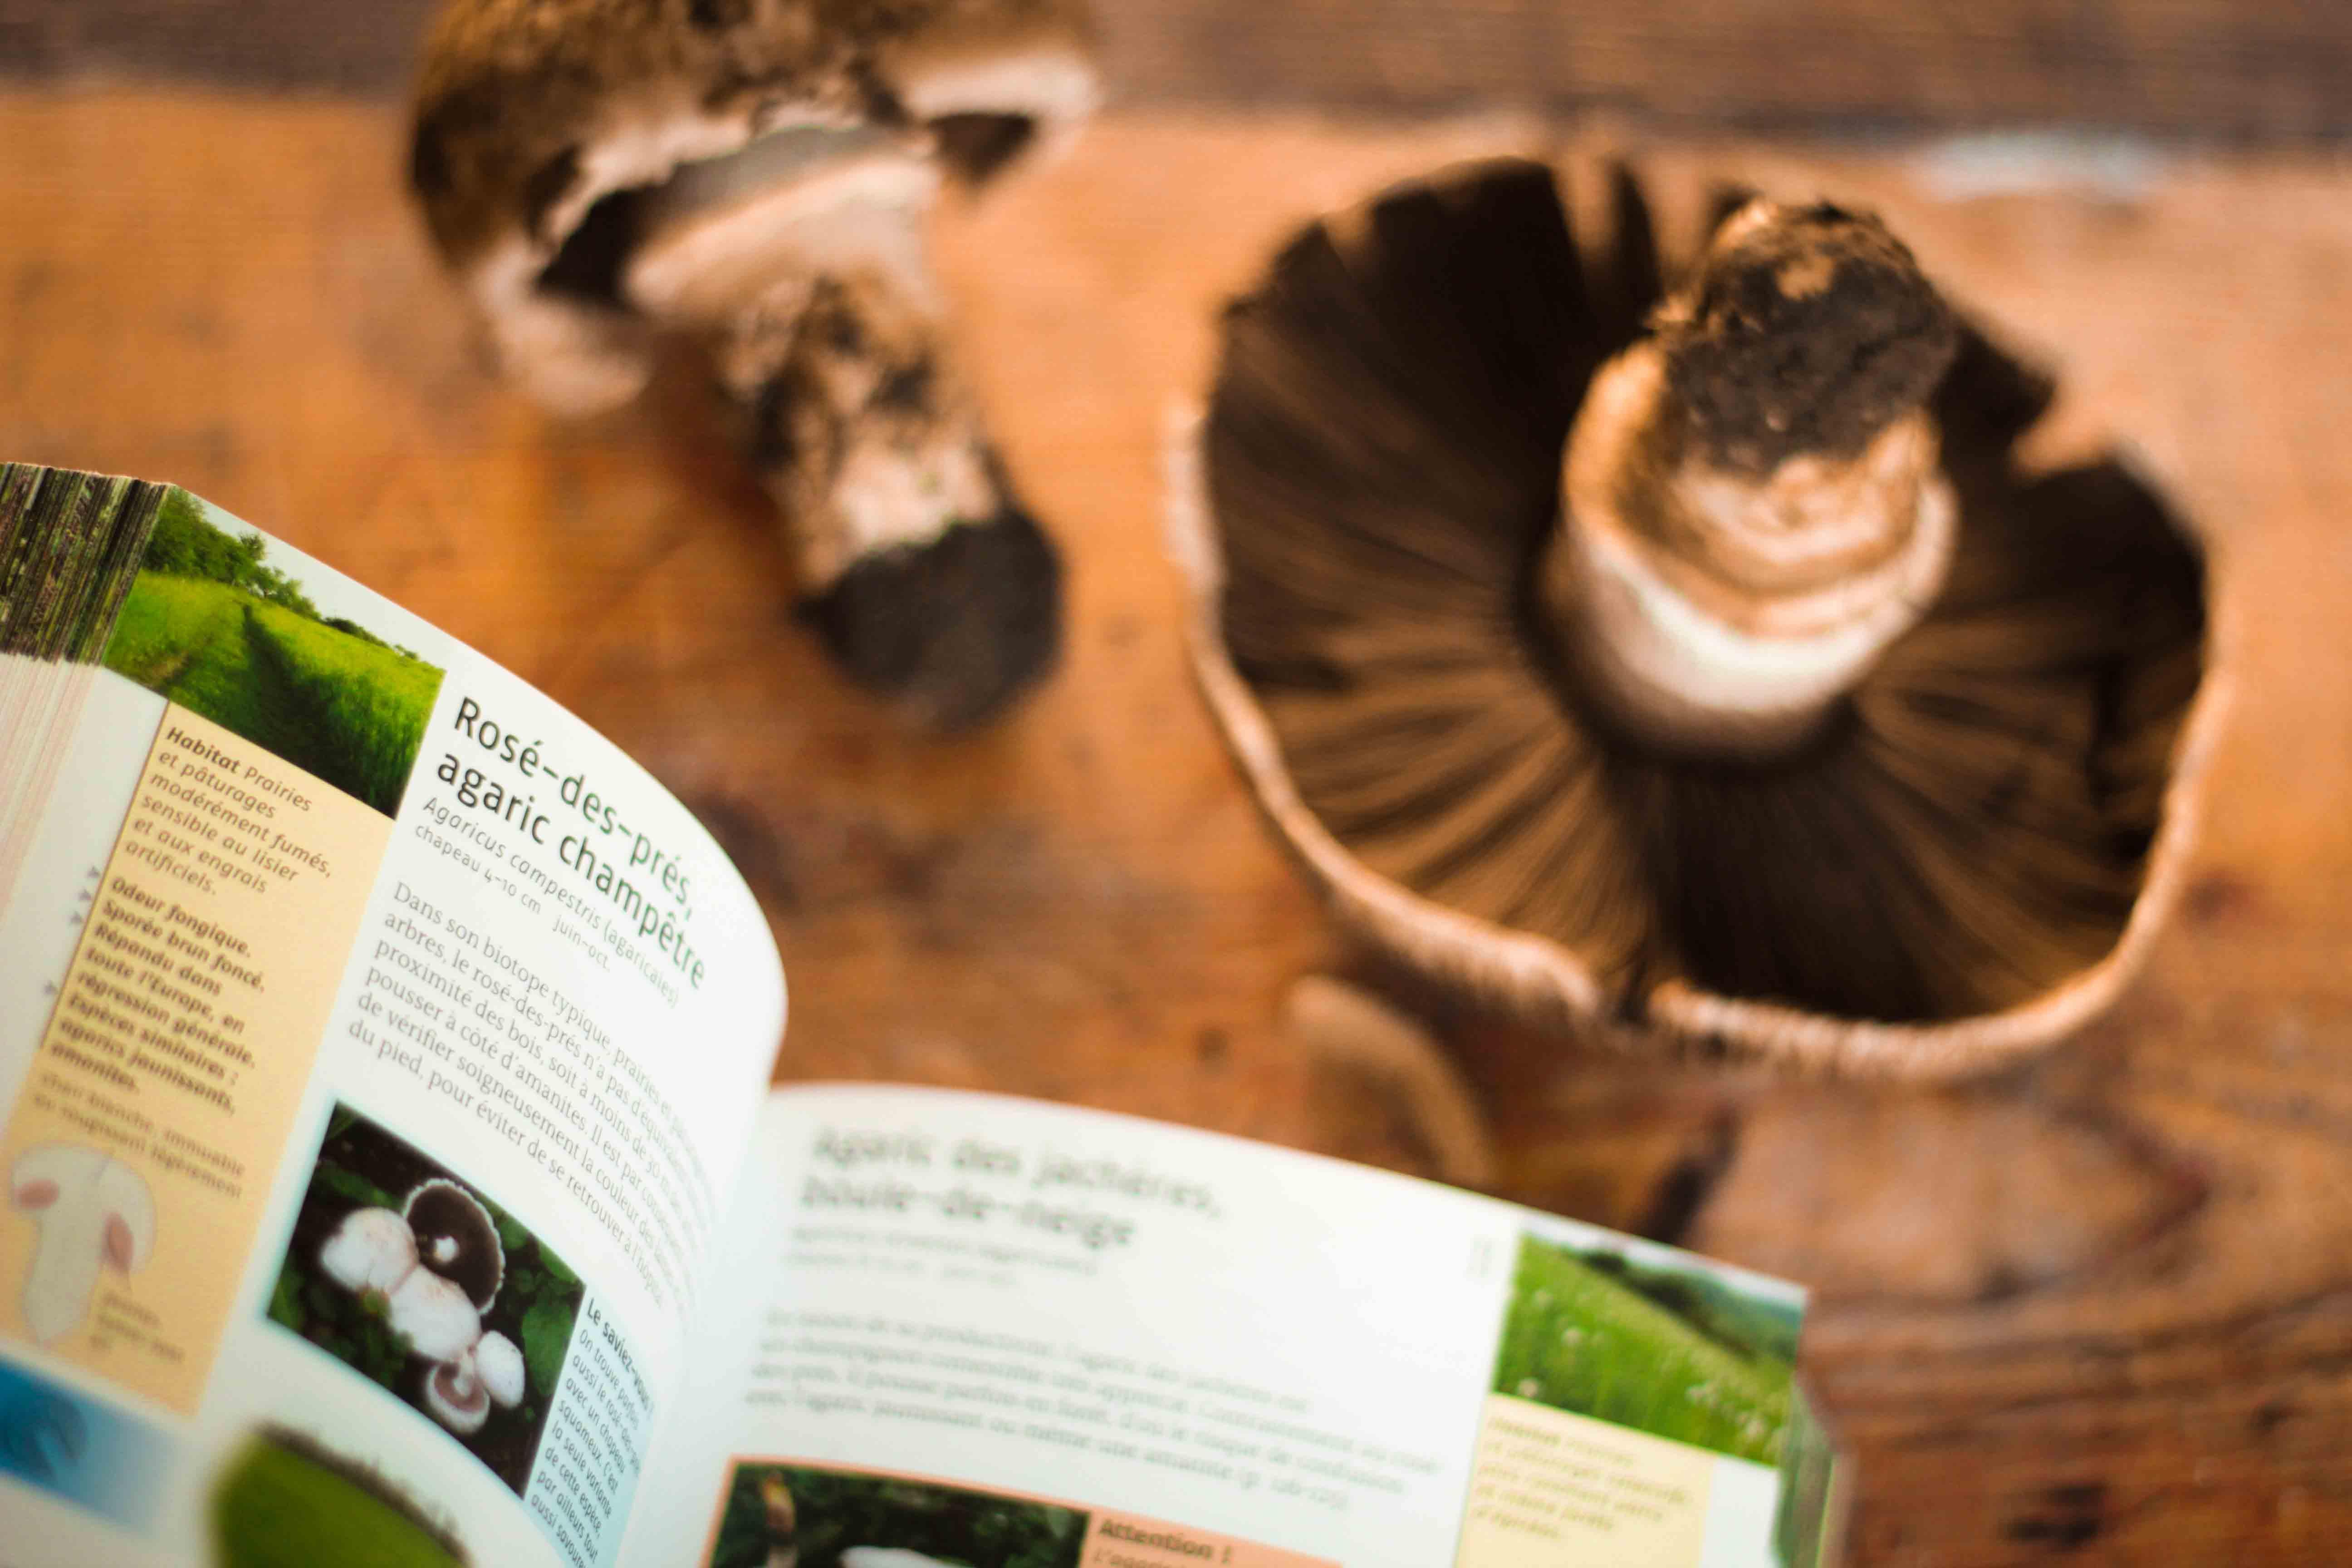 claudialeclercq-edible mushrooms-champignons comestibles_-18